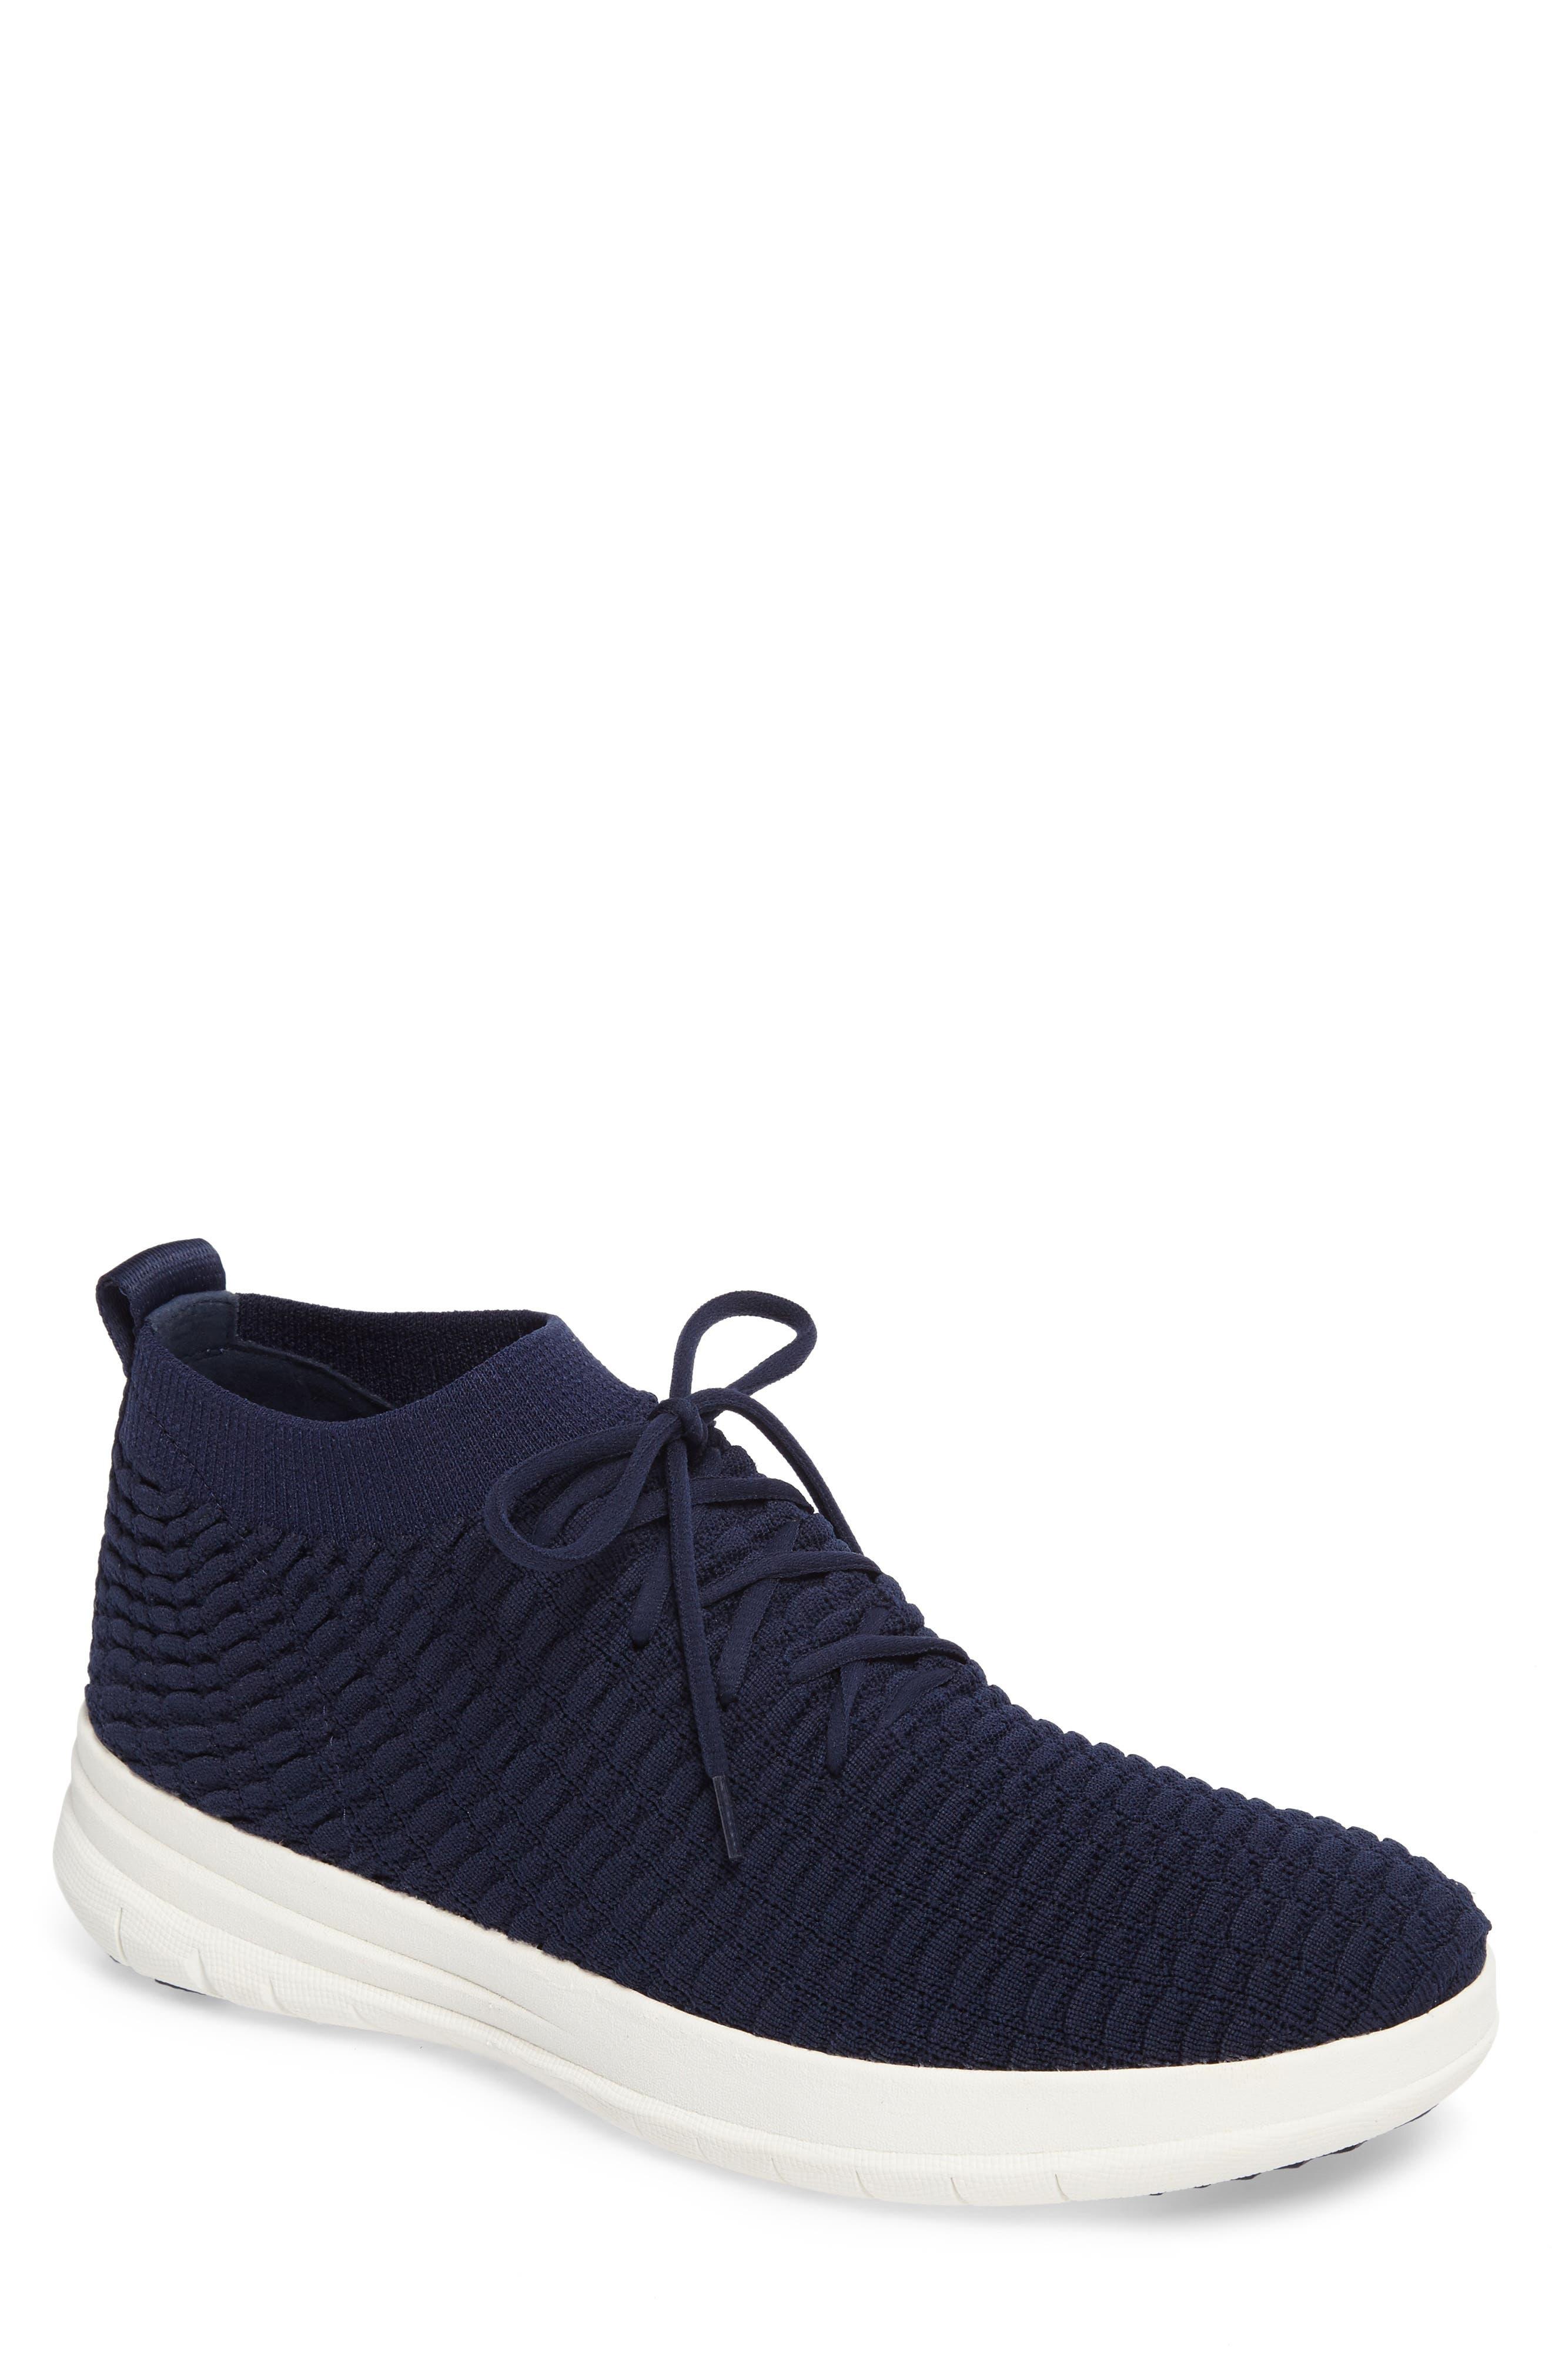 Uberknit Sneaker,                             Main thumbnail 1, color,                             DARK SAPPHIRE TEXTILE